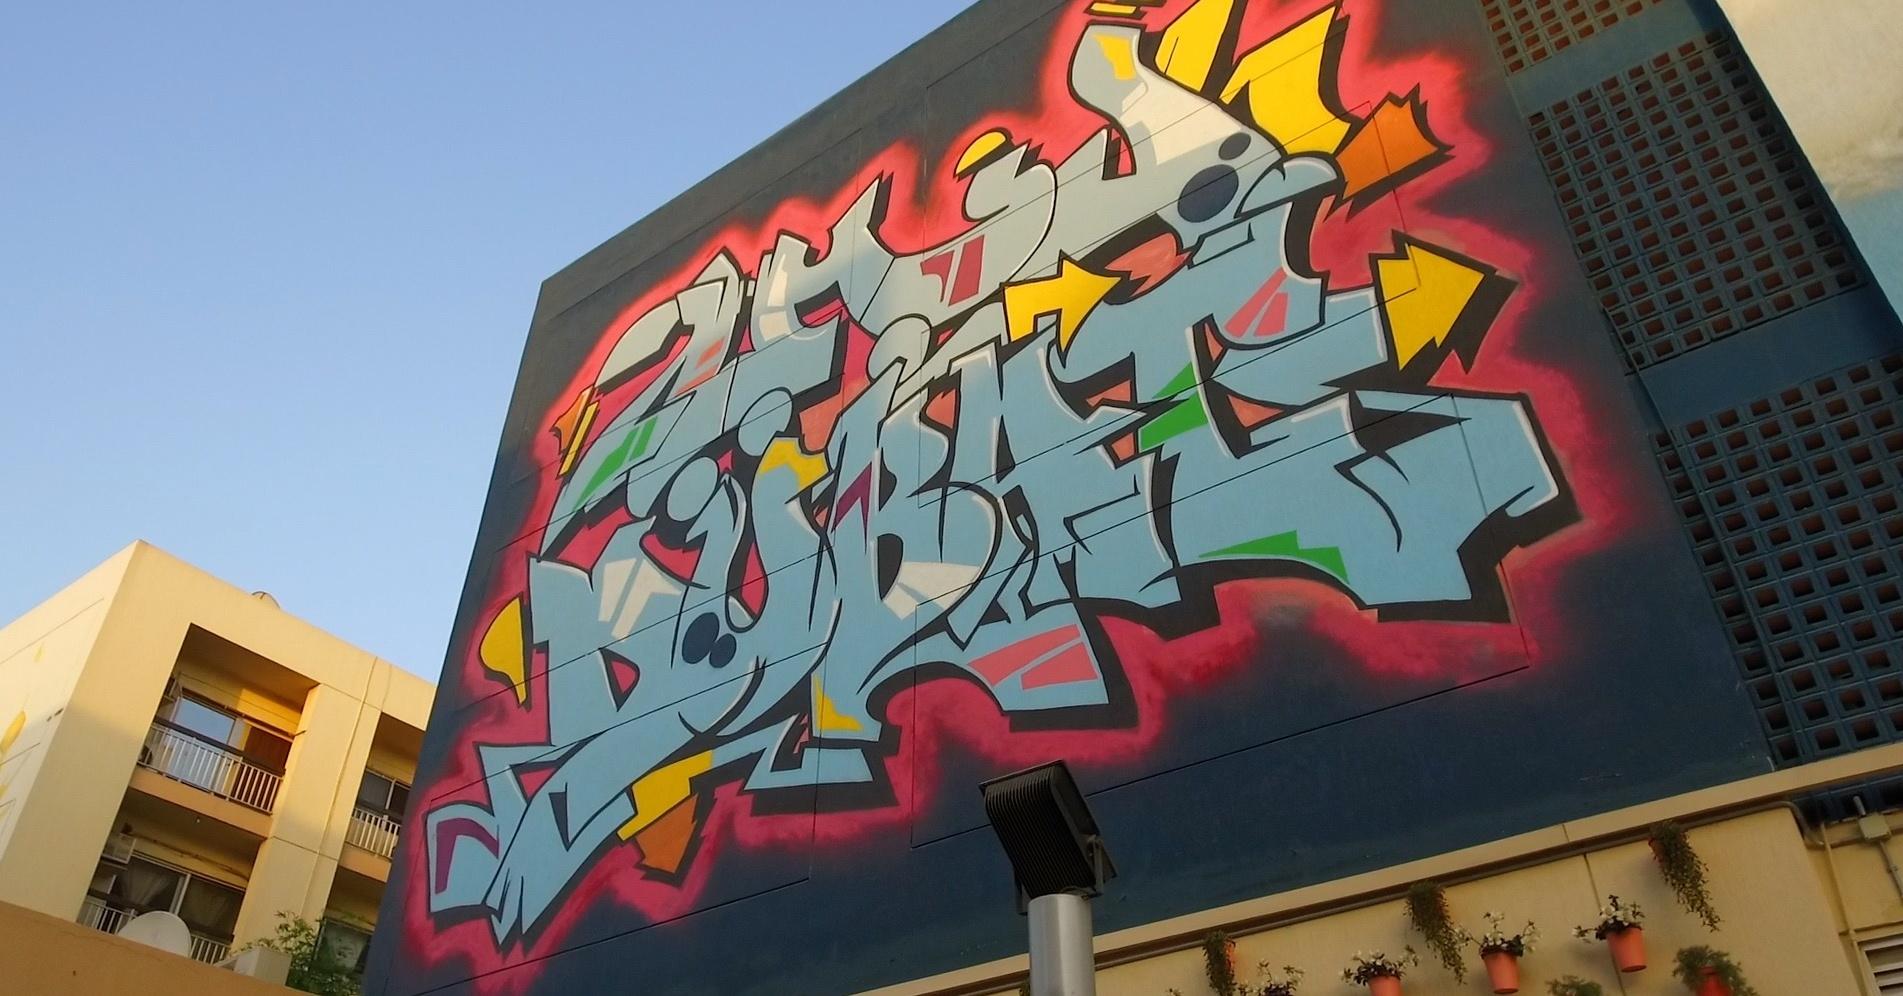 free things to do in dubai today - street art in dubai